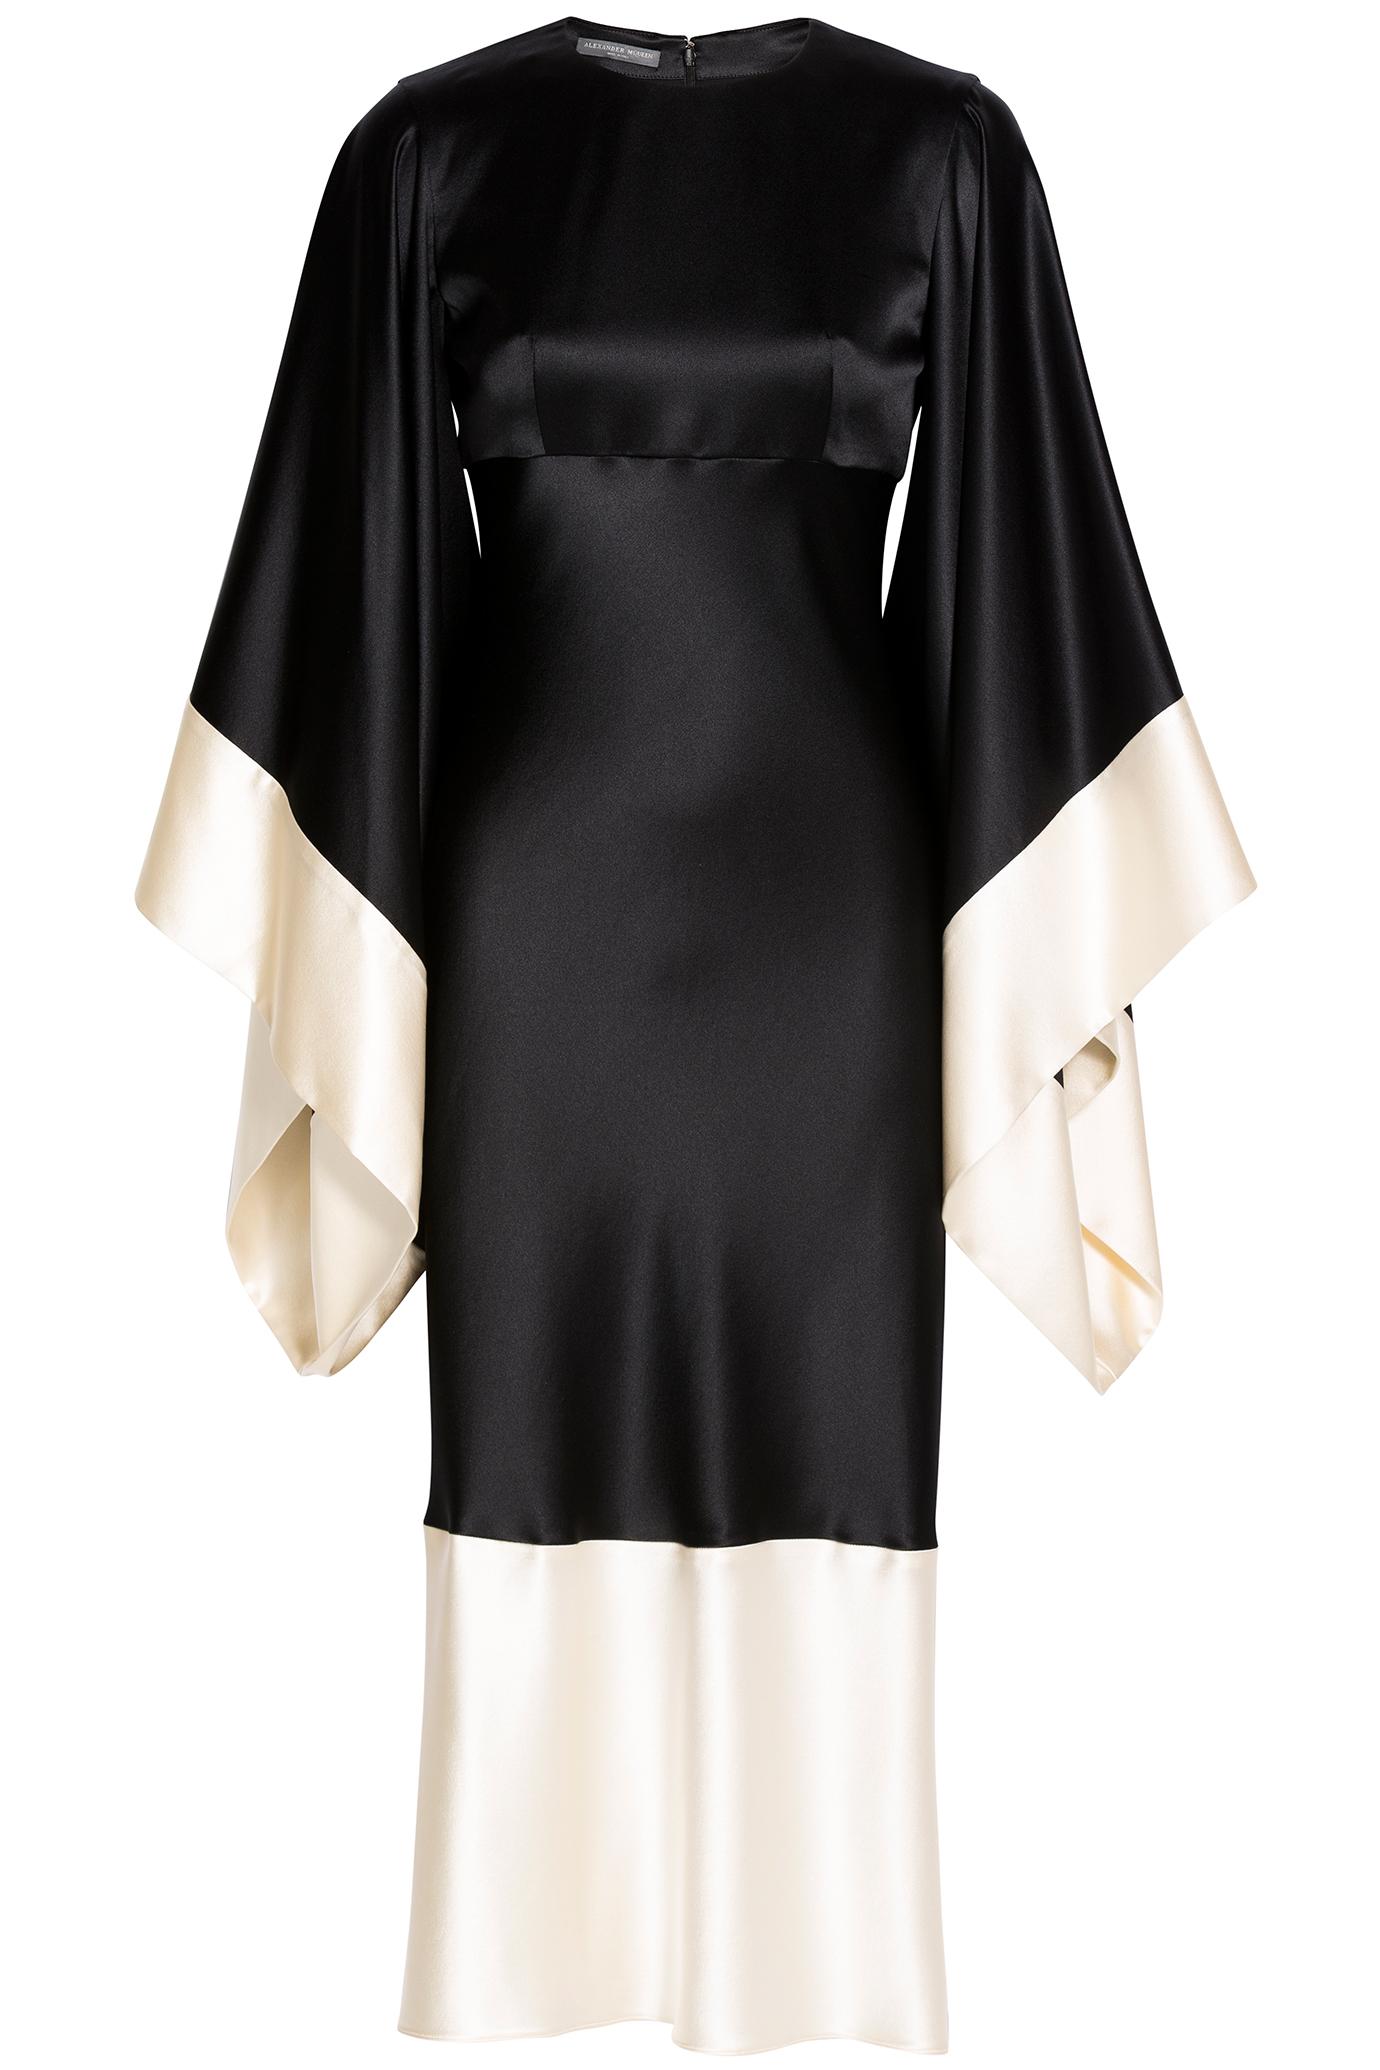 Designer Kimono Sleeve Dress